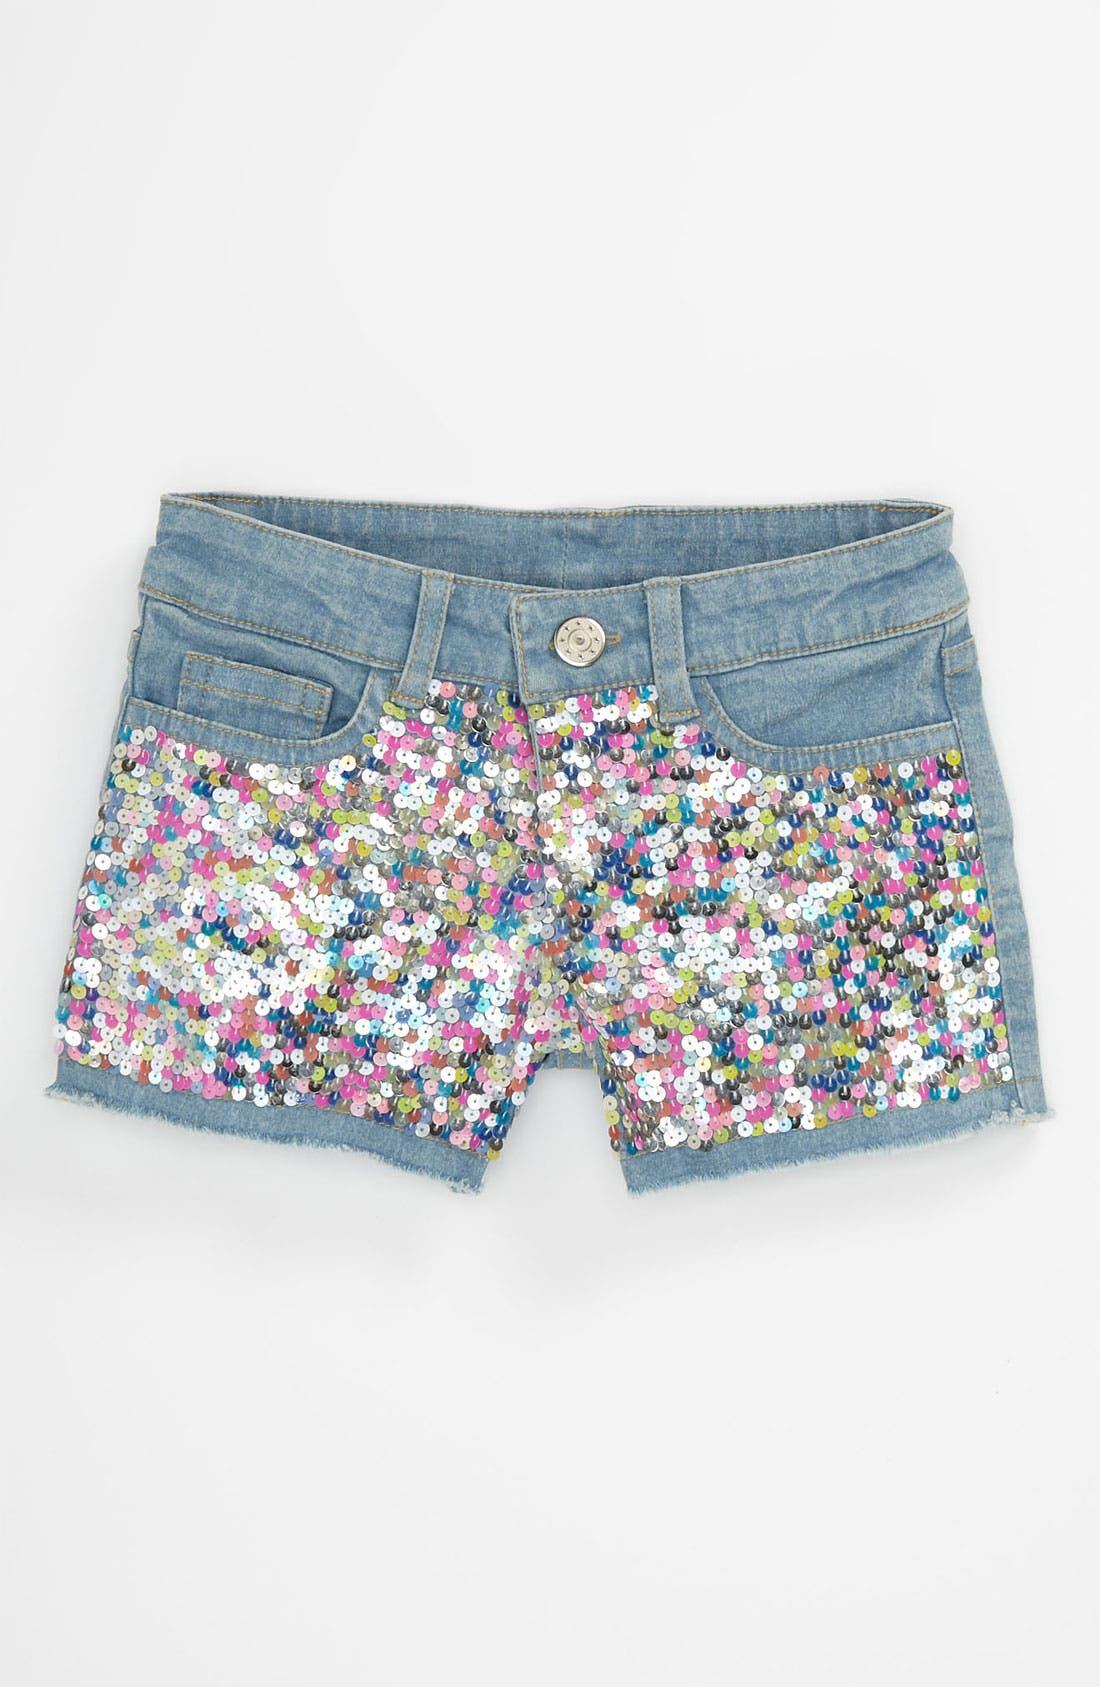 Alternate Image 1 Selected - Flowers by Zoe Sequin Denim Shorts (Big Girls)